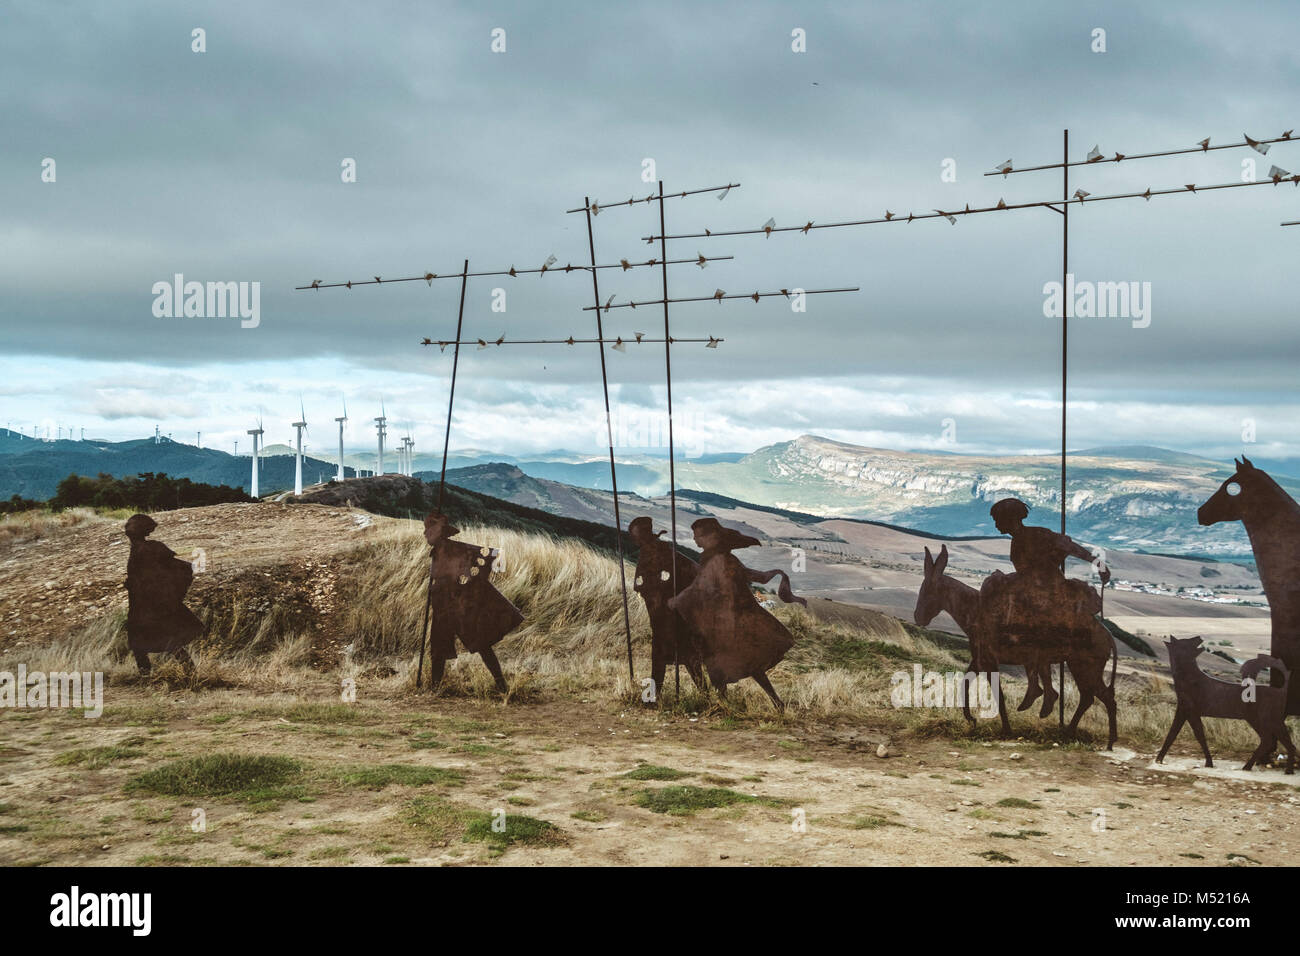 Caravan of pilgrims sculpture by Vicente Galvete on road to Santiago de Compostela, Pamplona, Navarre, Spain - Stock Image